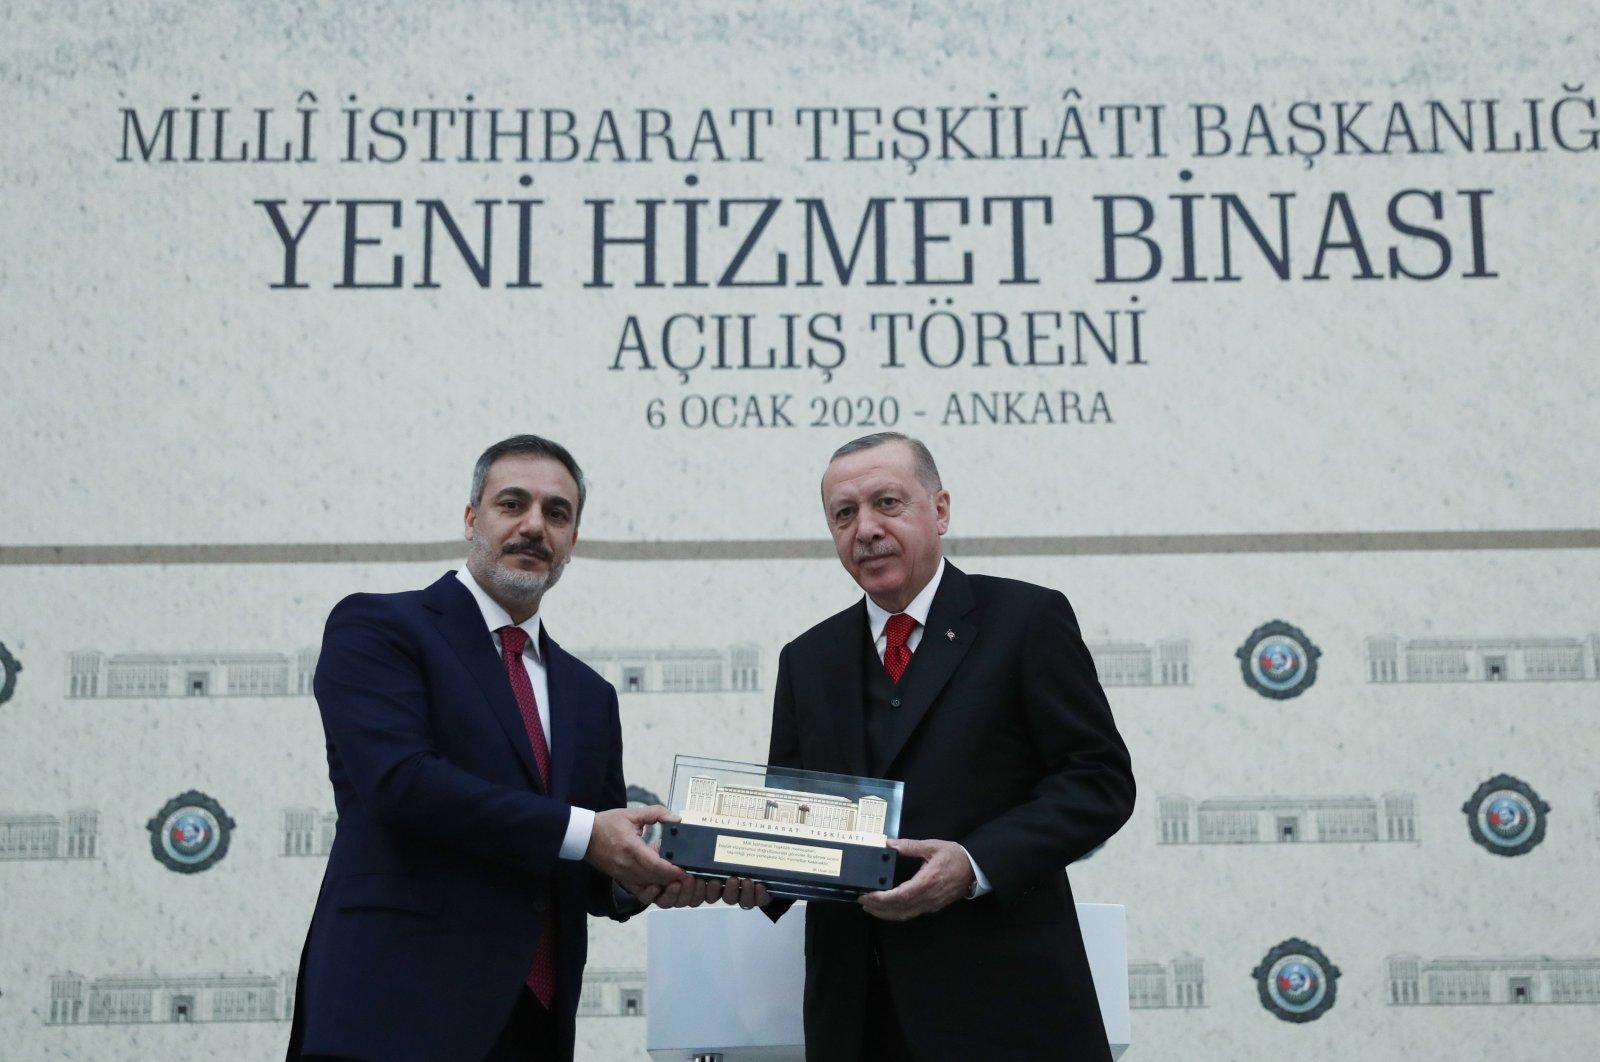 MIT President Hakan Fidan attends an event with President Recep Tayyip Erdoğan, in the capital Ankara, Turkey, Jan. 6, 2020. (AA Photo)